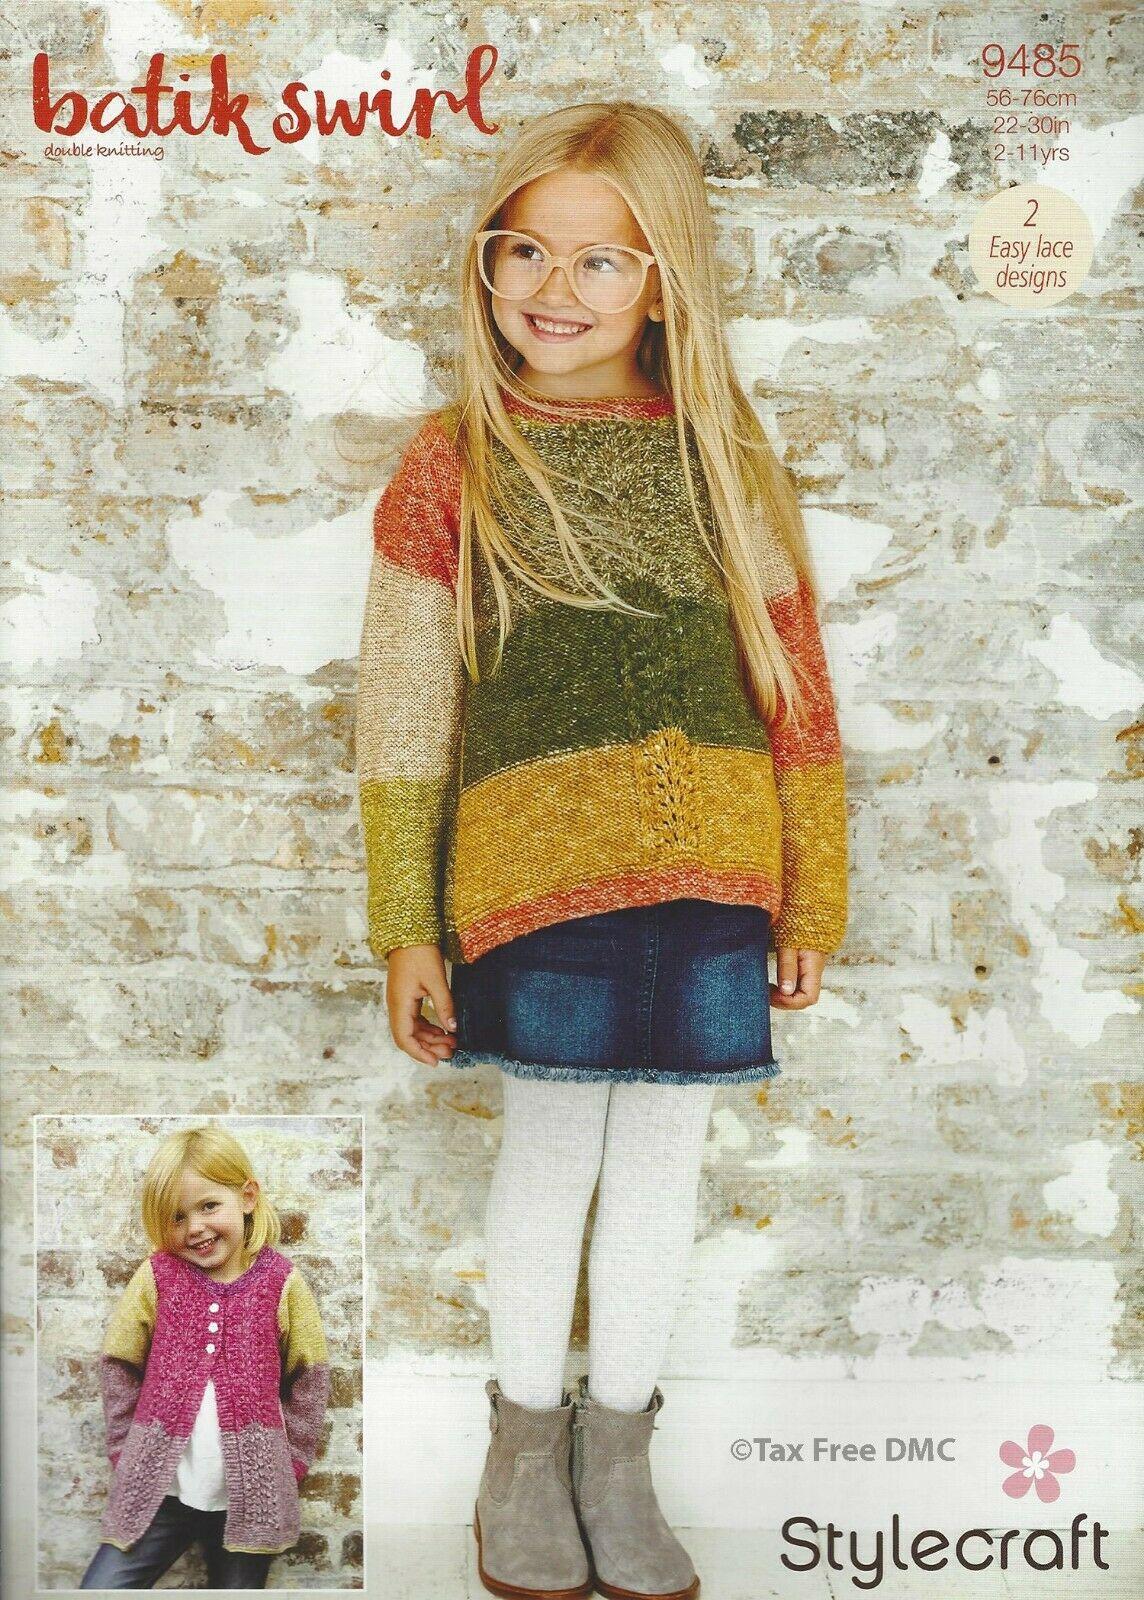 Knitting Pattern - Stylecraft 9485 Sweater and Cardigan in Batik Swirl DK